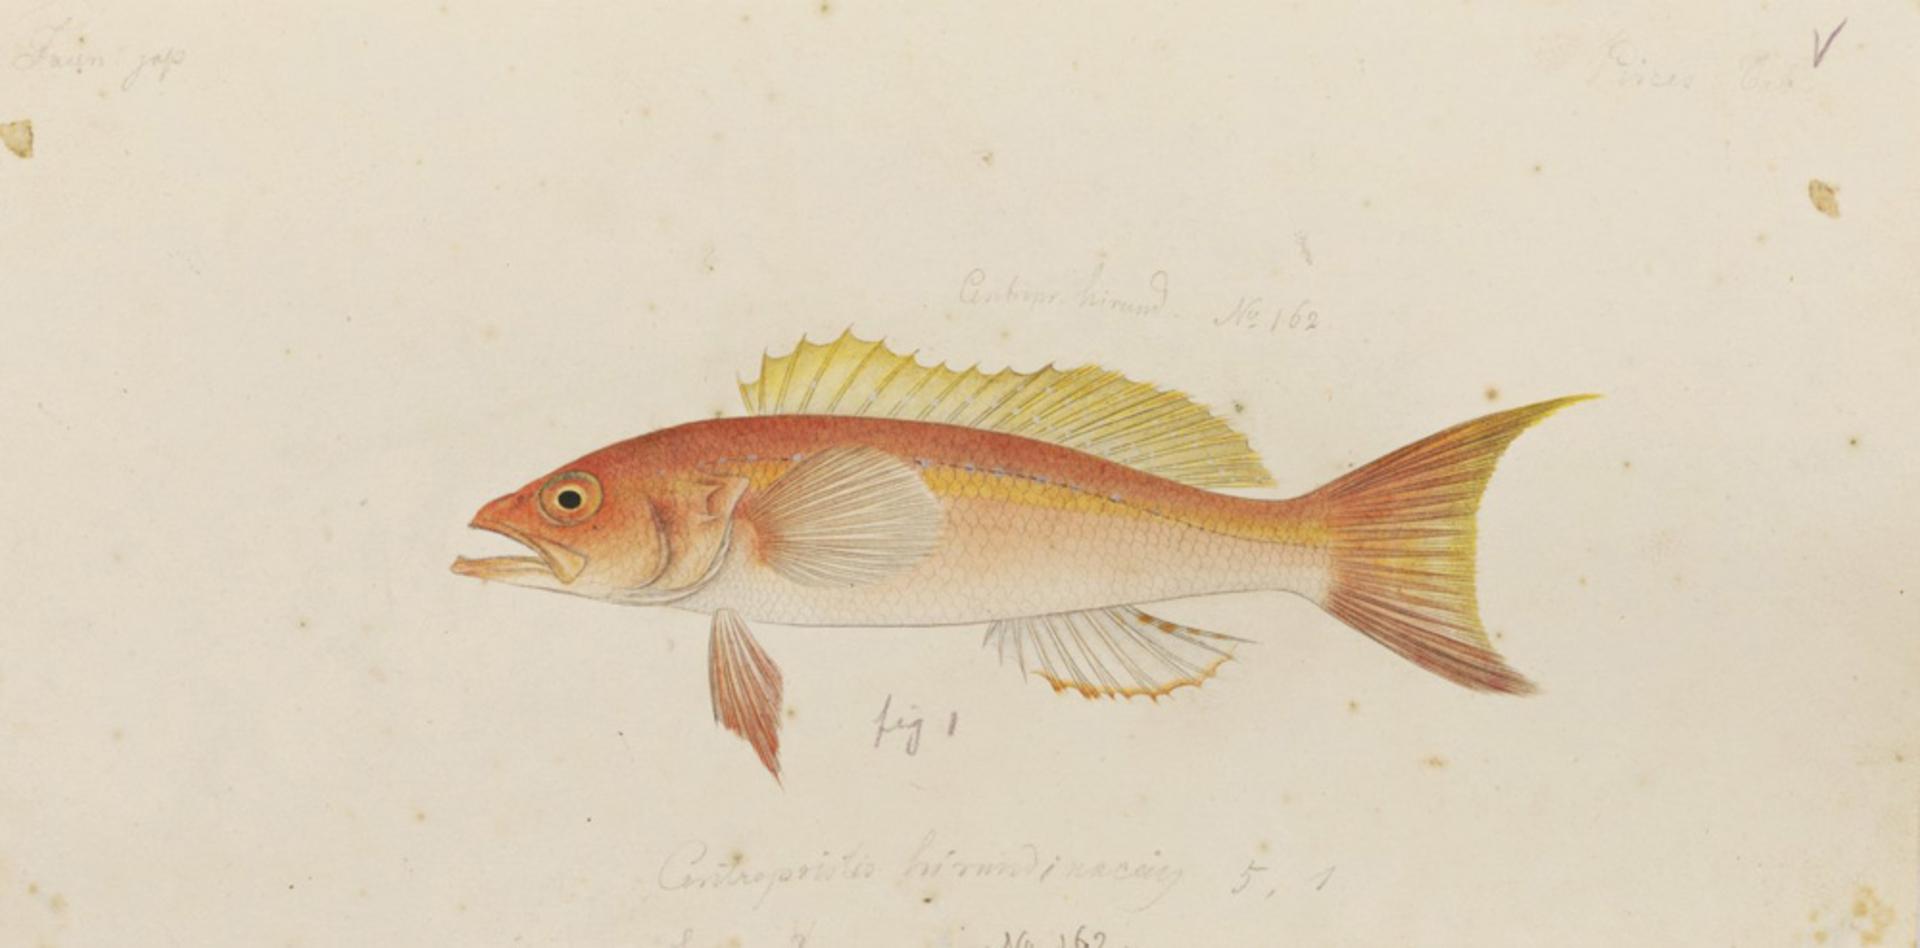 RMNH.ART.587 | Chelidoperca hirundinacea